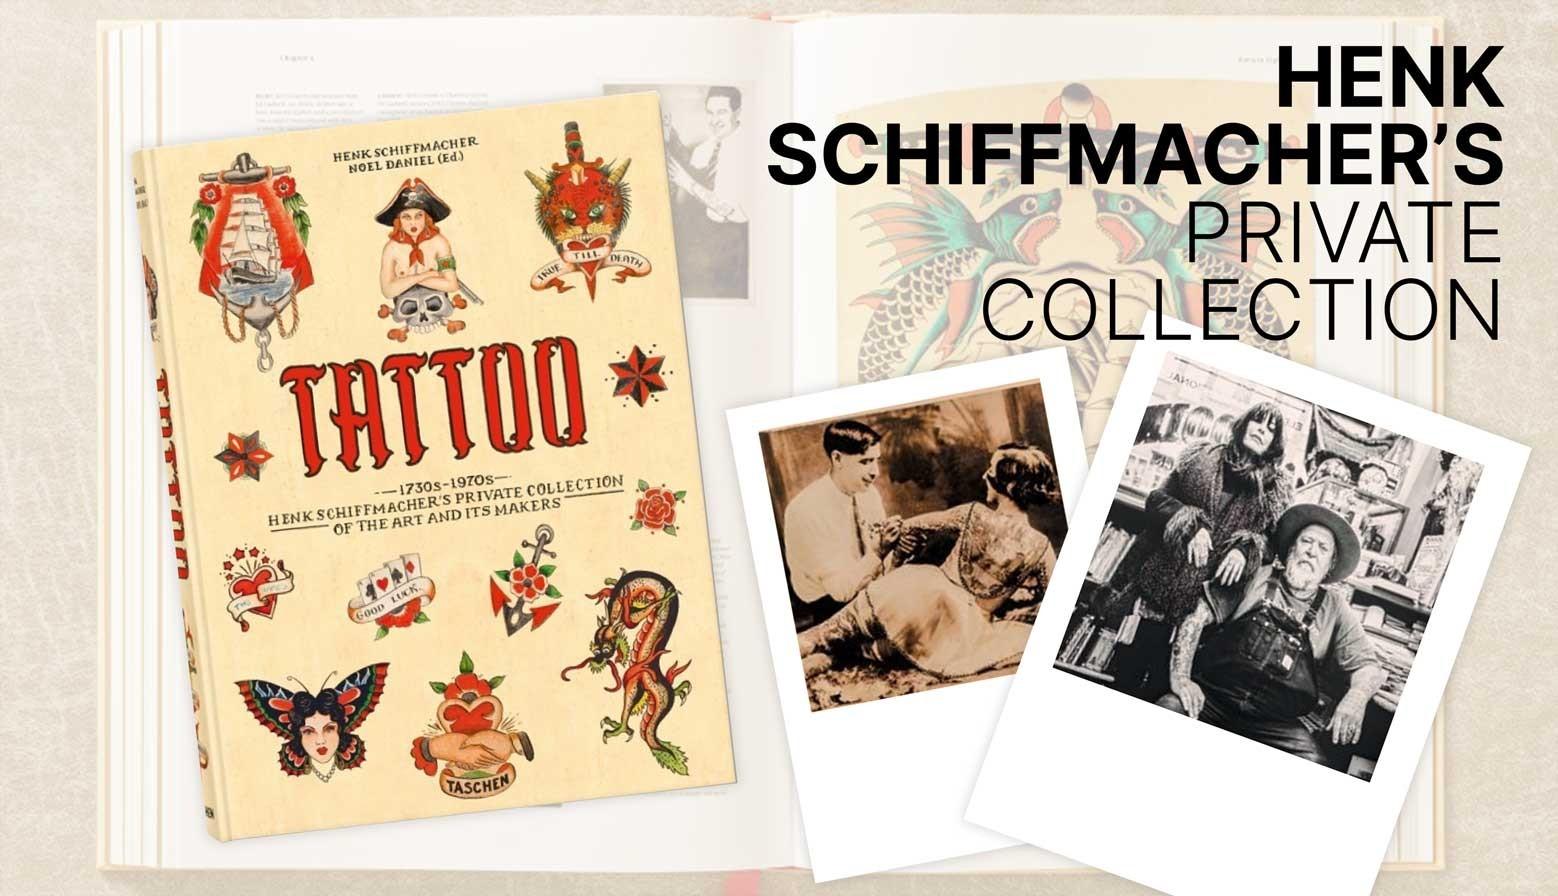 slideshow 1730 1970 henk schiffmacher tattoo book